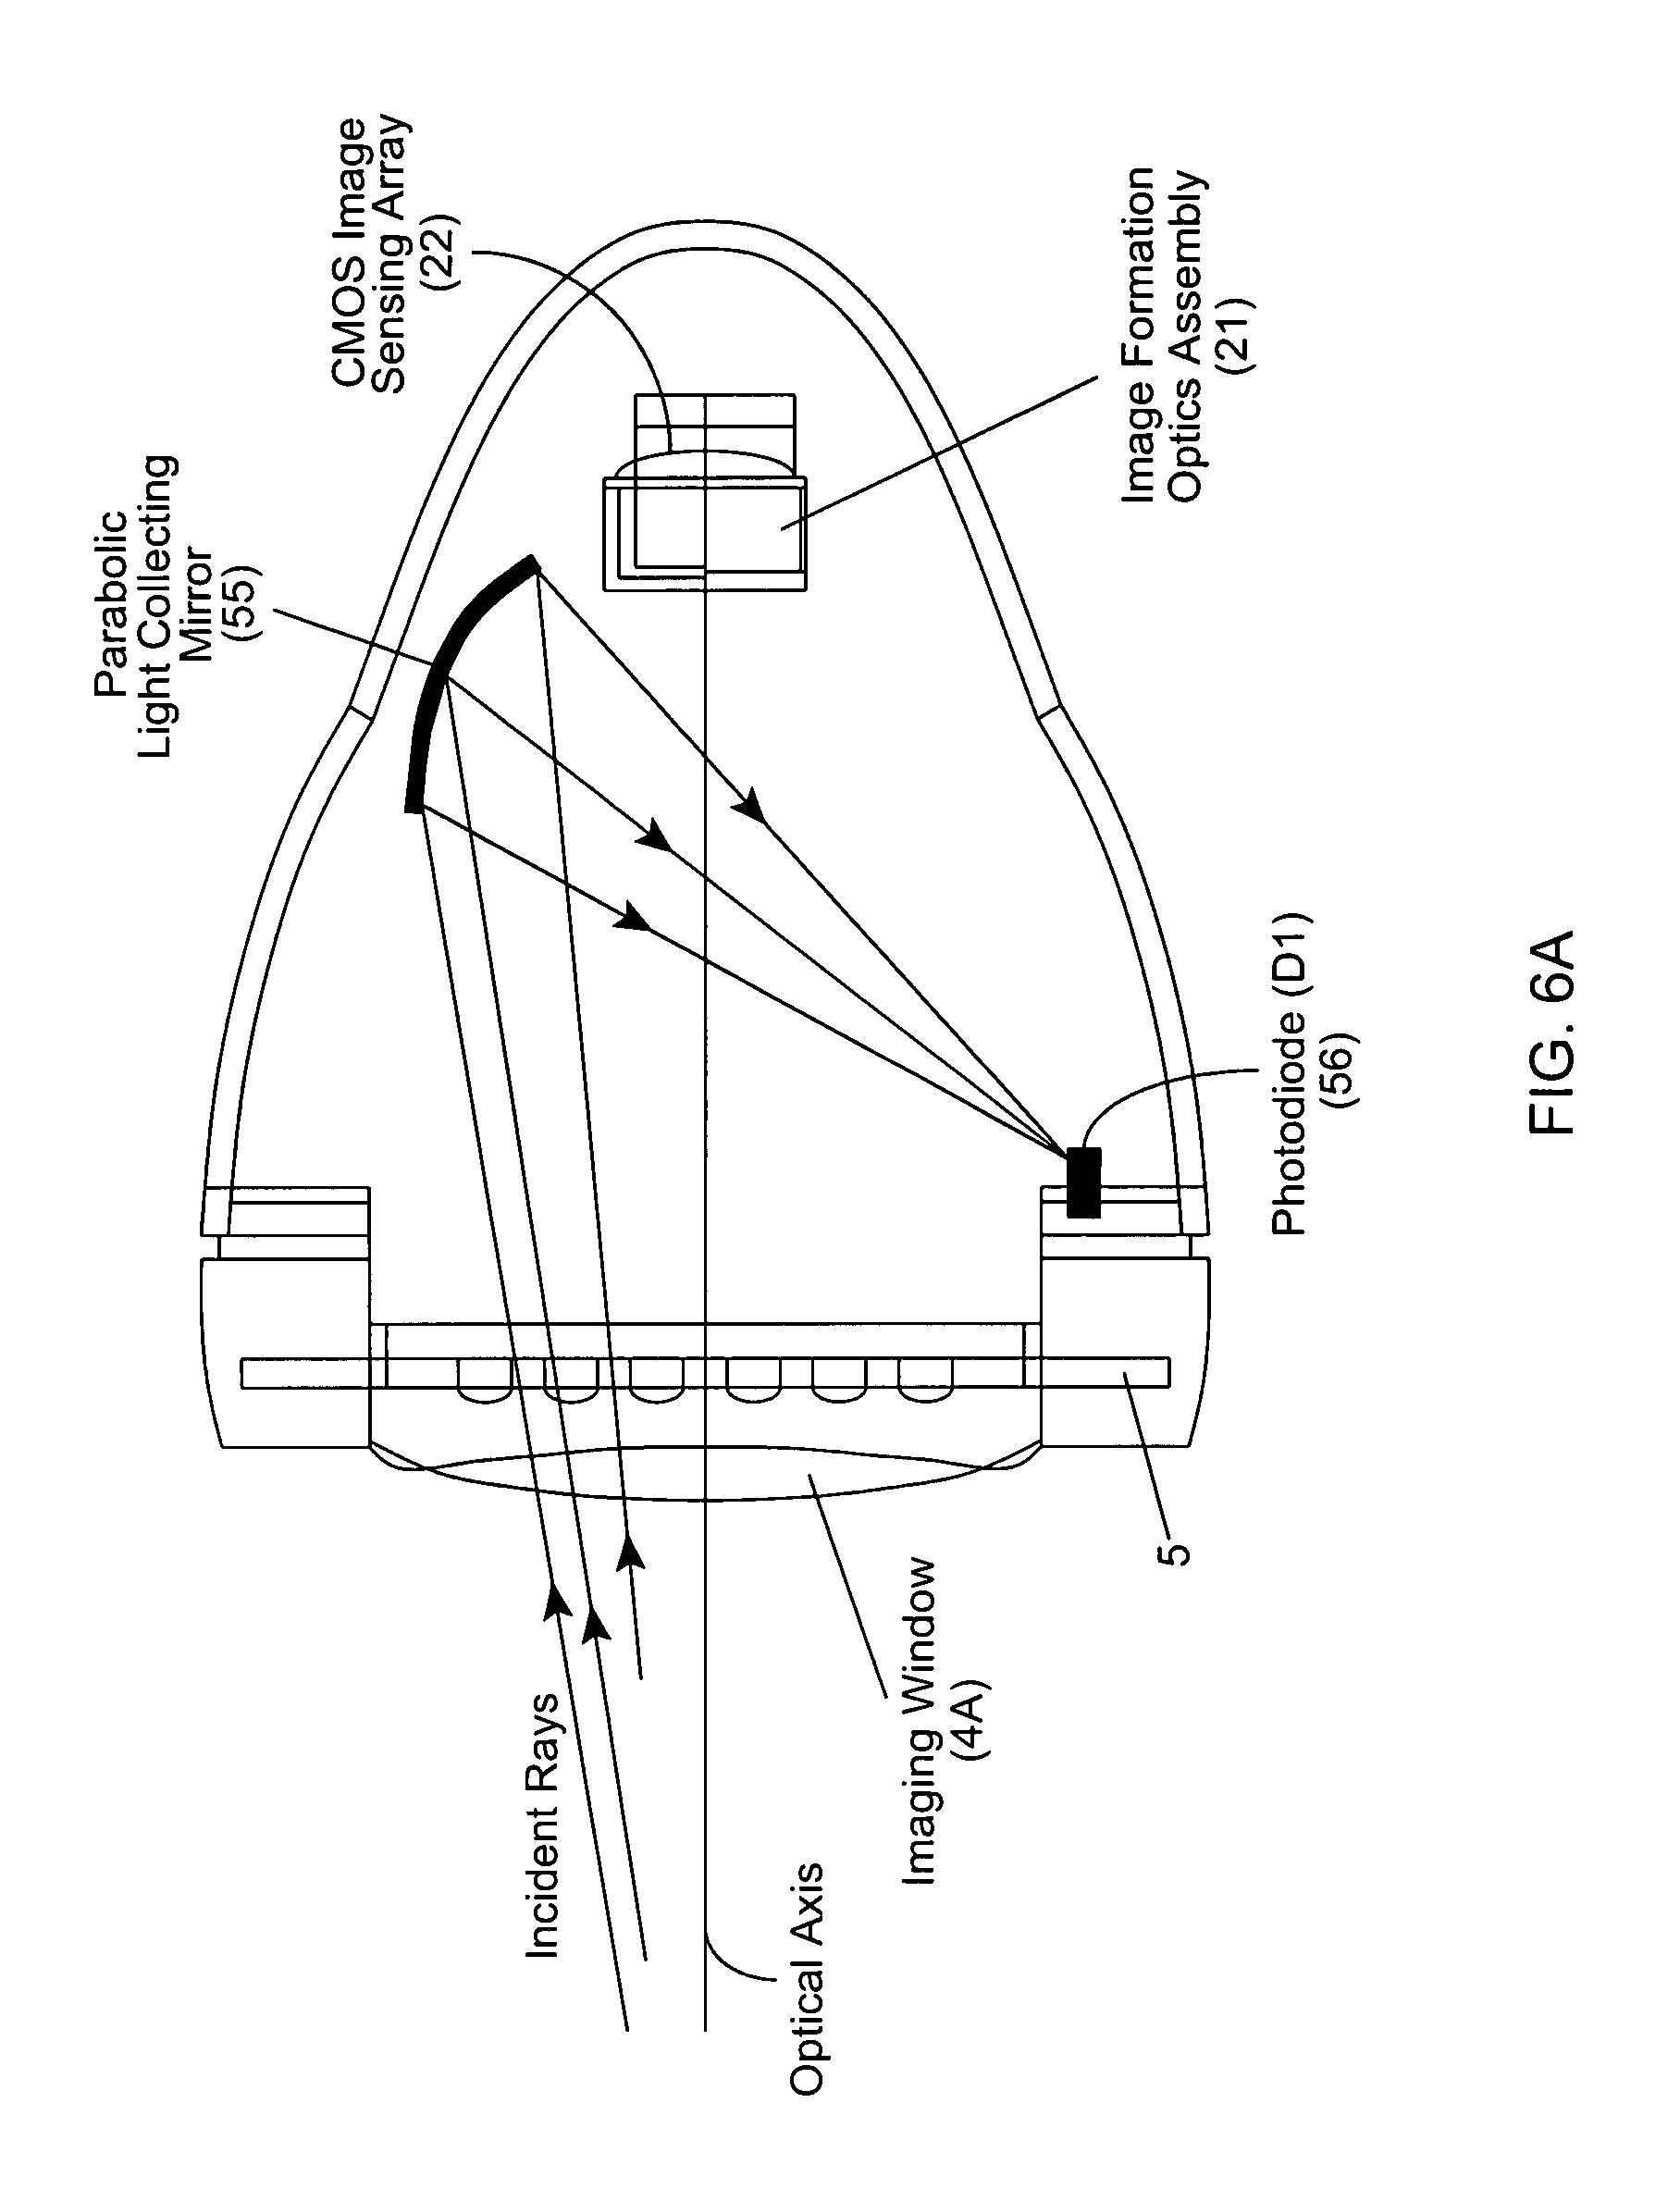 Patent Us 7712666 B2 Also Motion Sensor Block Diagram Moreover Wiring Guide Shock Images